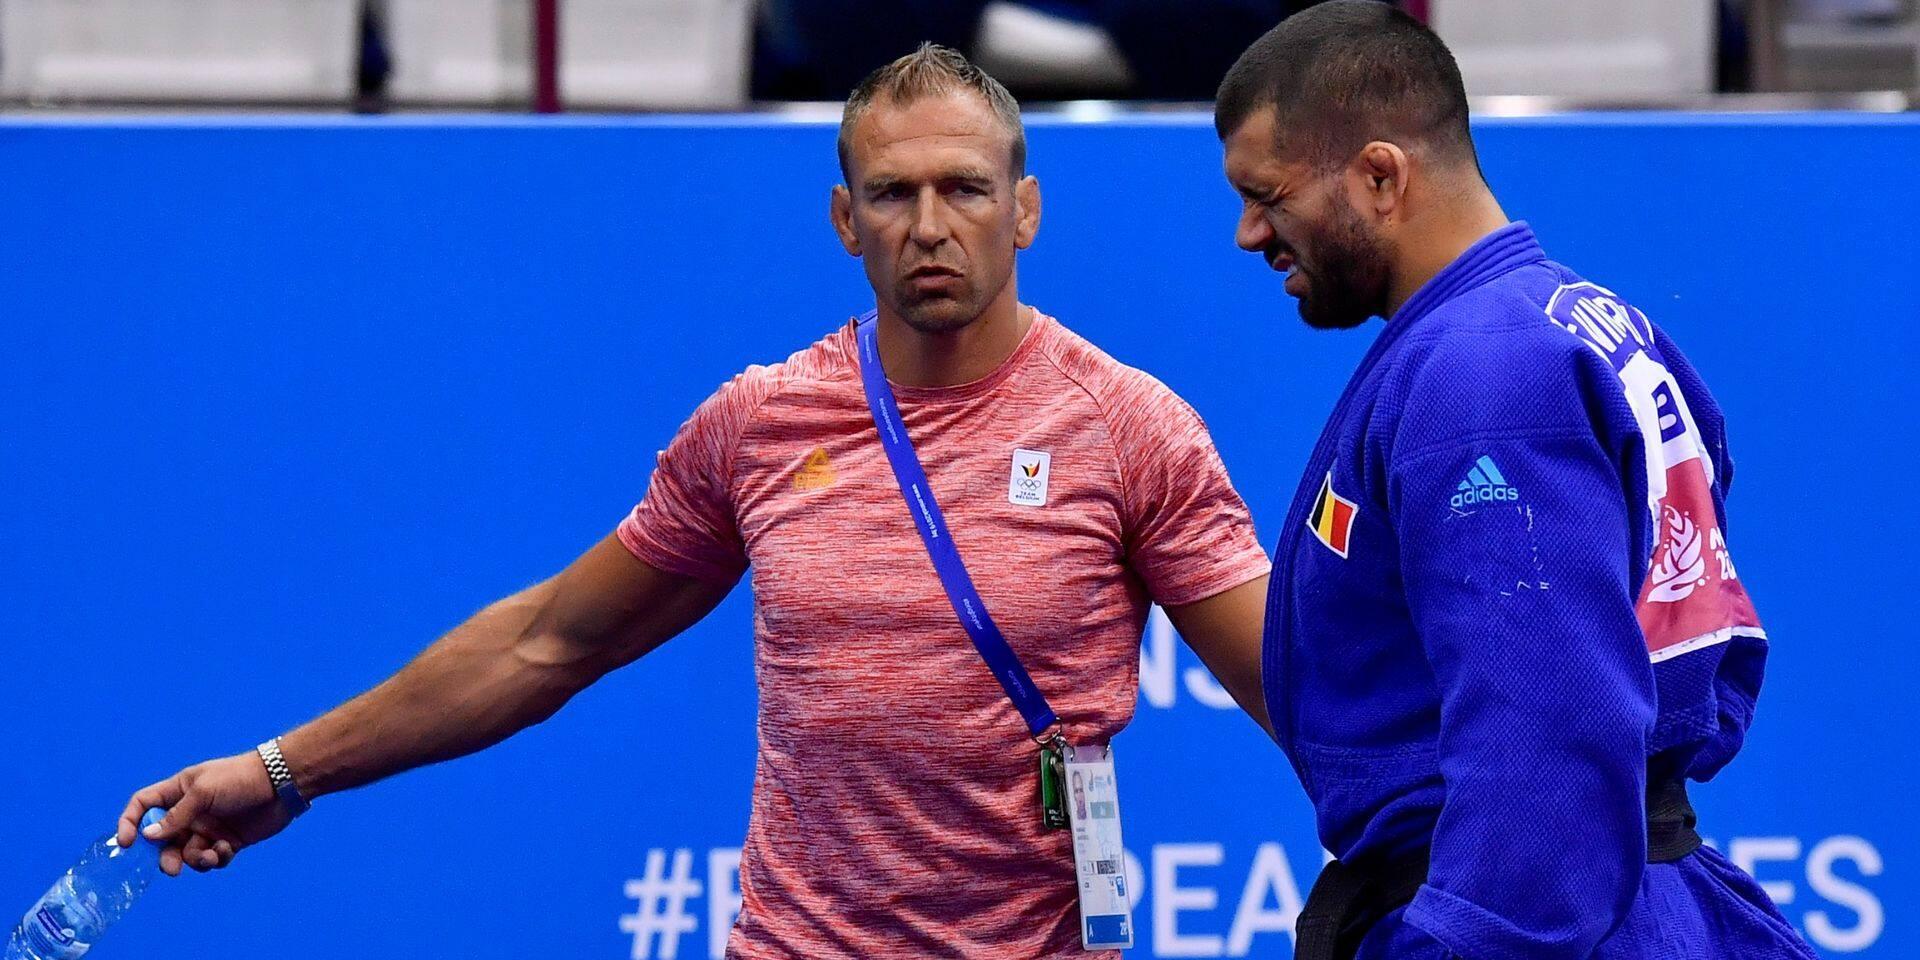 Judo: Damiano Martinuzzi tente de positiver après l'annulation du GP de Rabat